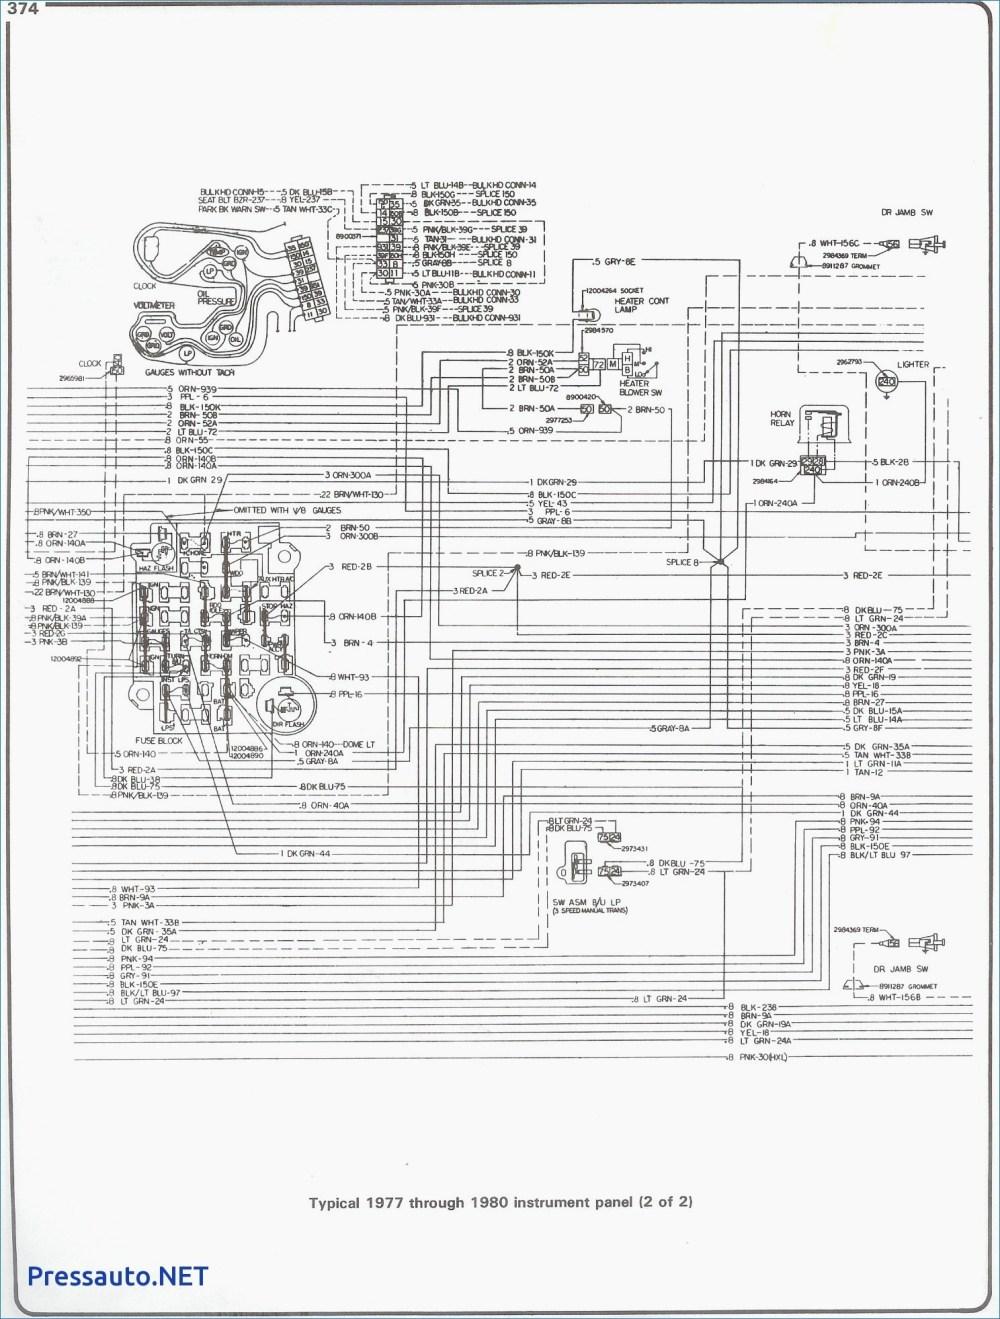 medium resolution of 1983 toyota pickup wiring diagram fancy 1987 toyota pickup wiring diagram frieze electrical diagram